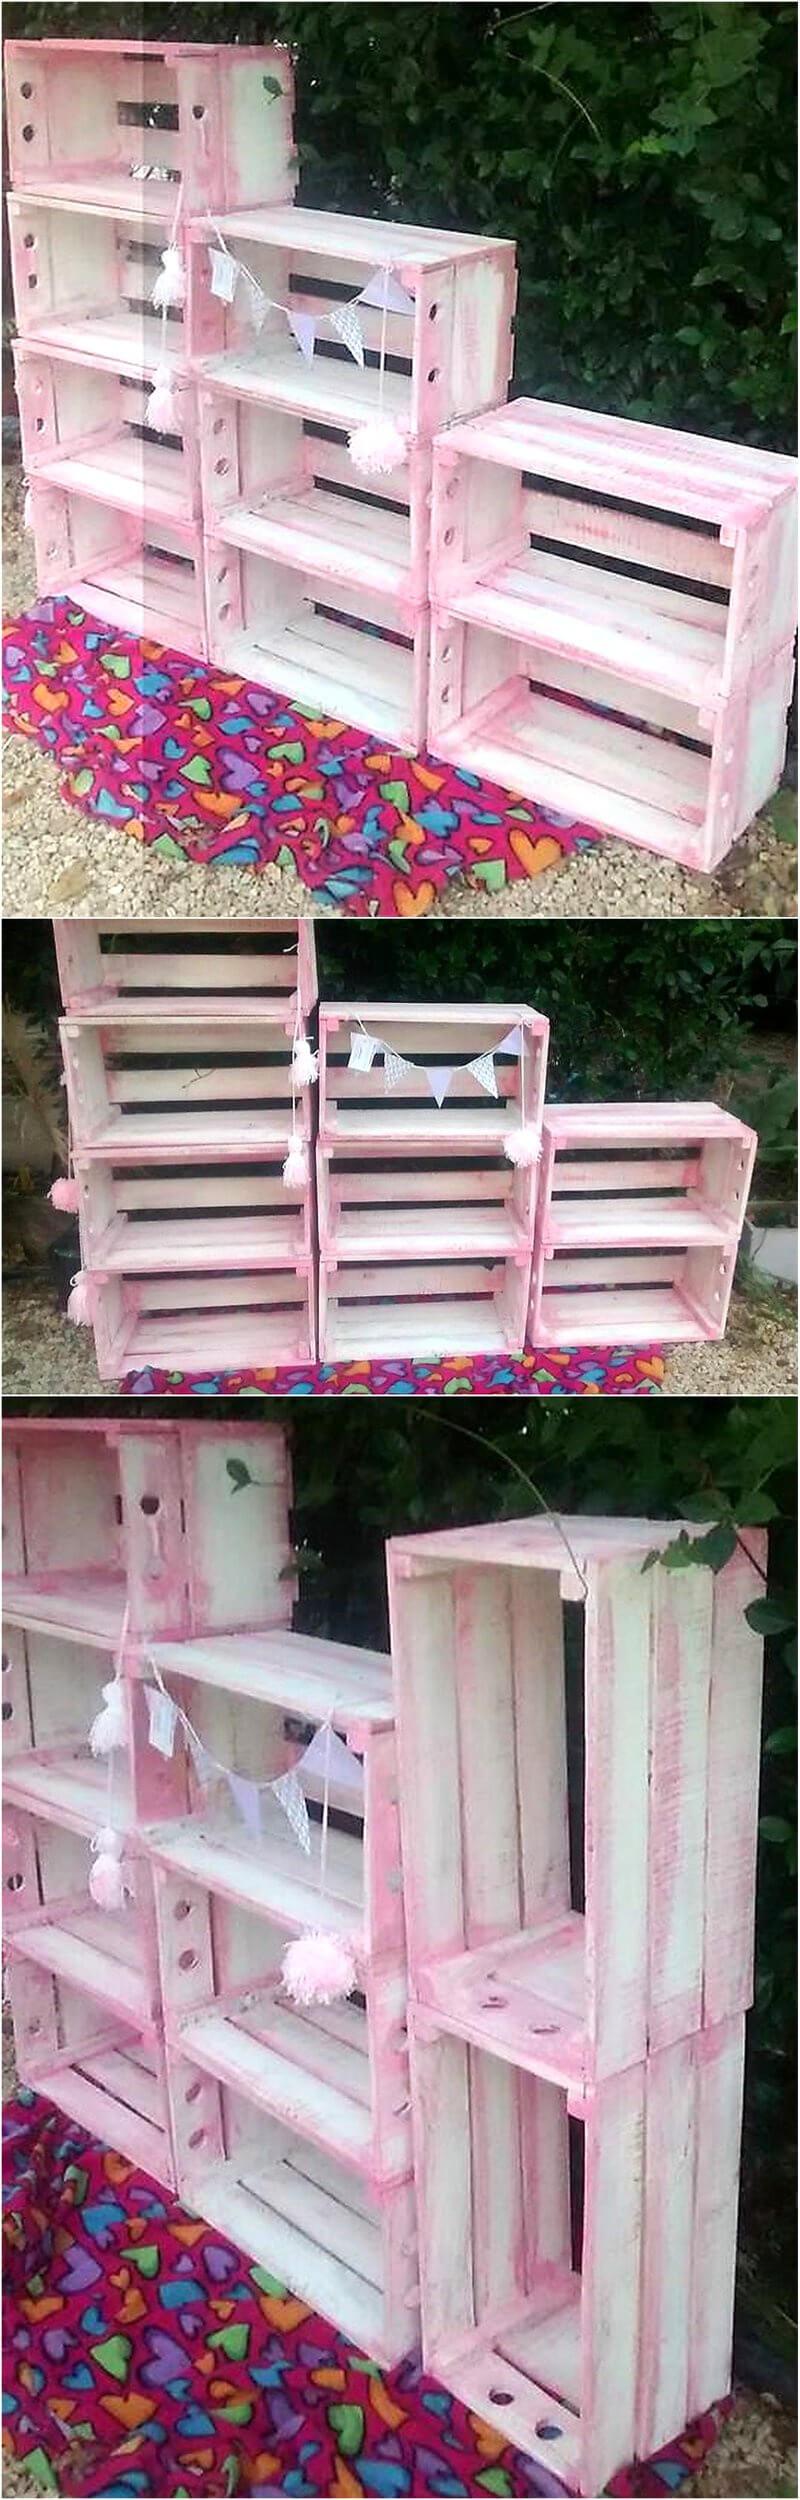 wood pallet fruit crates shelving rack